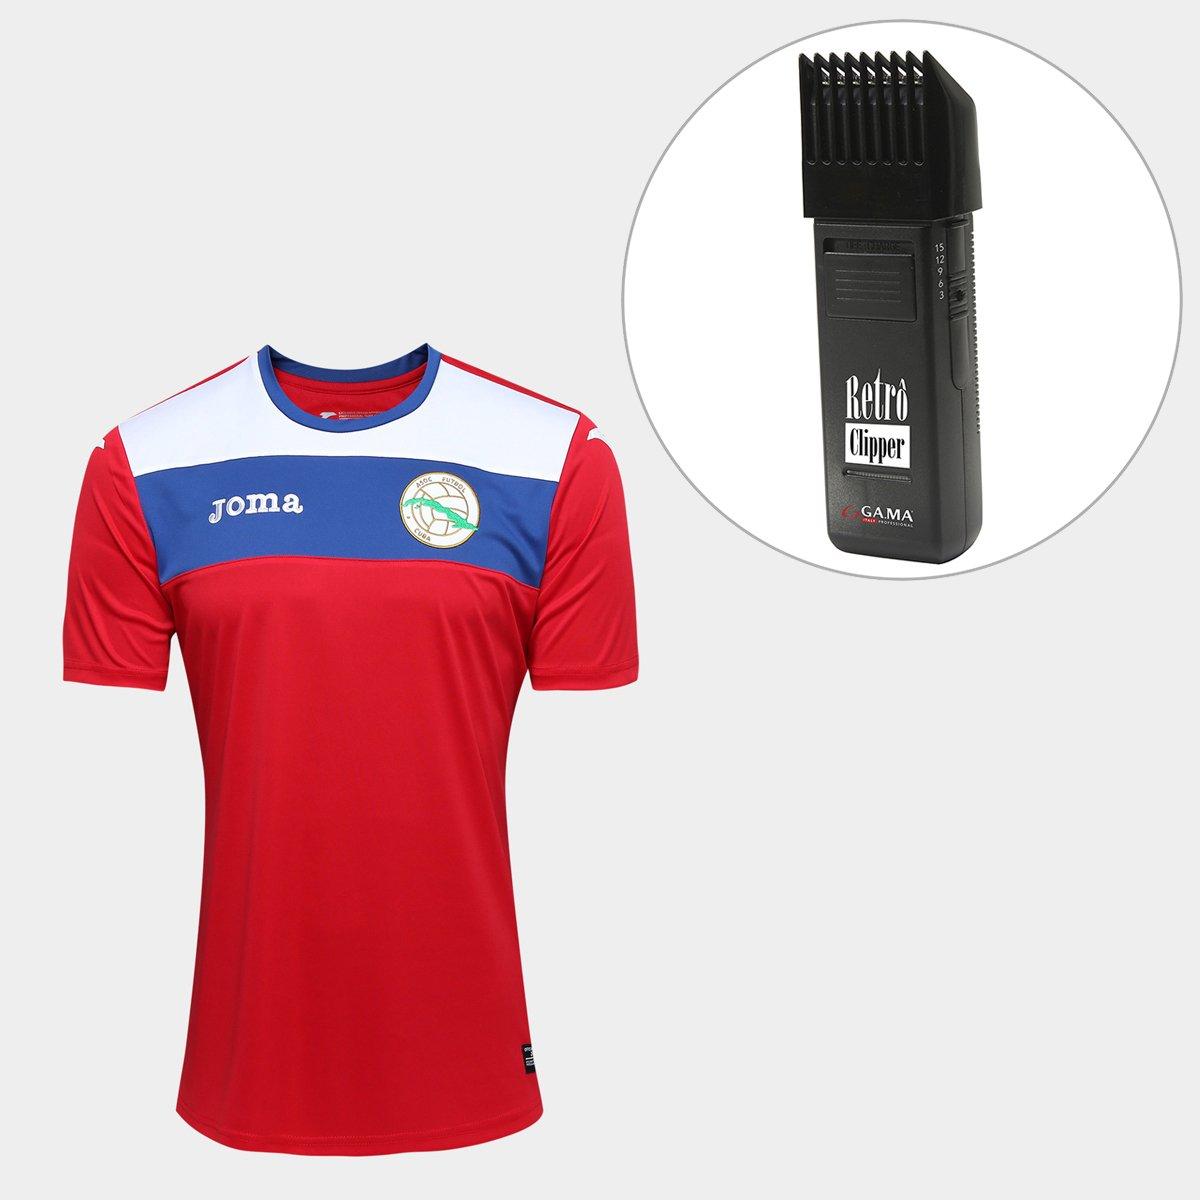 Kit Camisa Seleção Cuba Away 2017 s nº Torcedor Joma Masculina + Maquina  Retrô Gama Italy Bivolt - Compre Agora  fd8e11f312c54